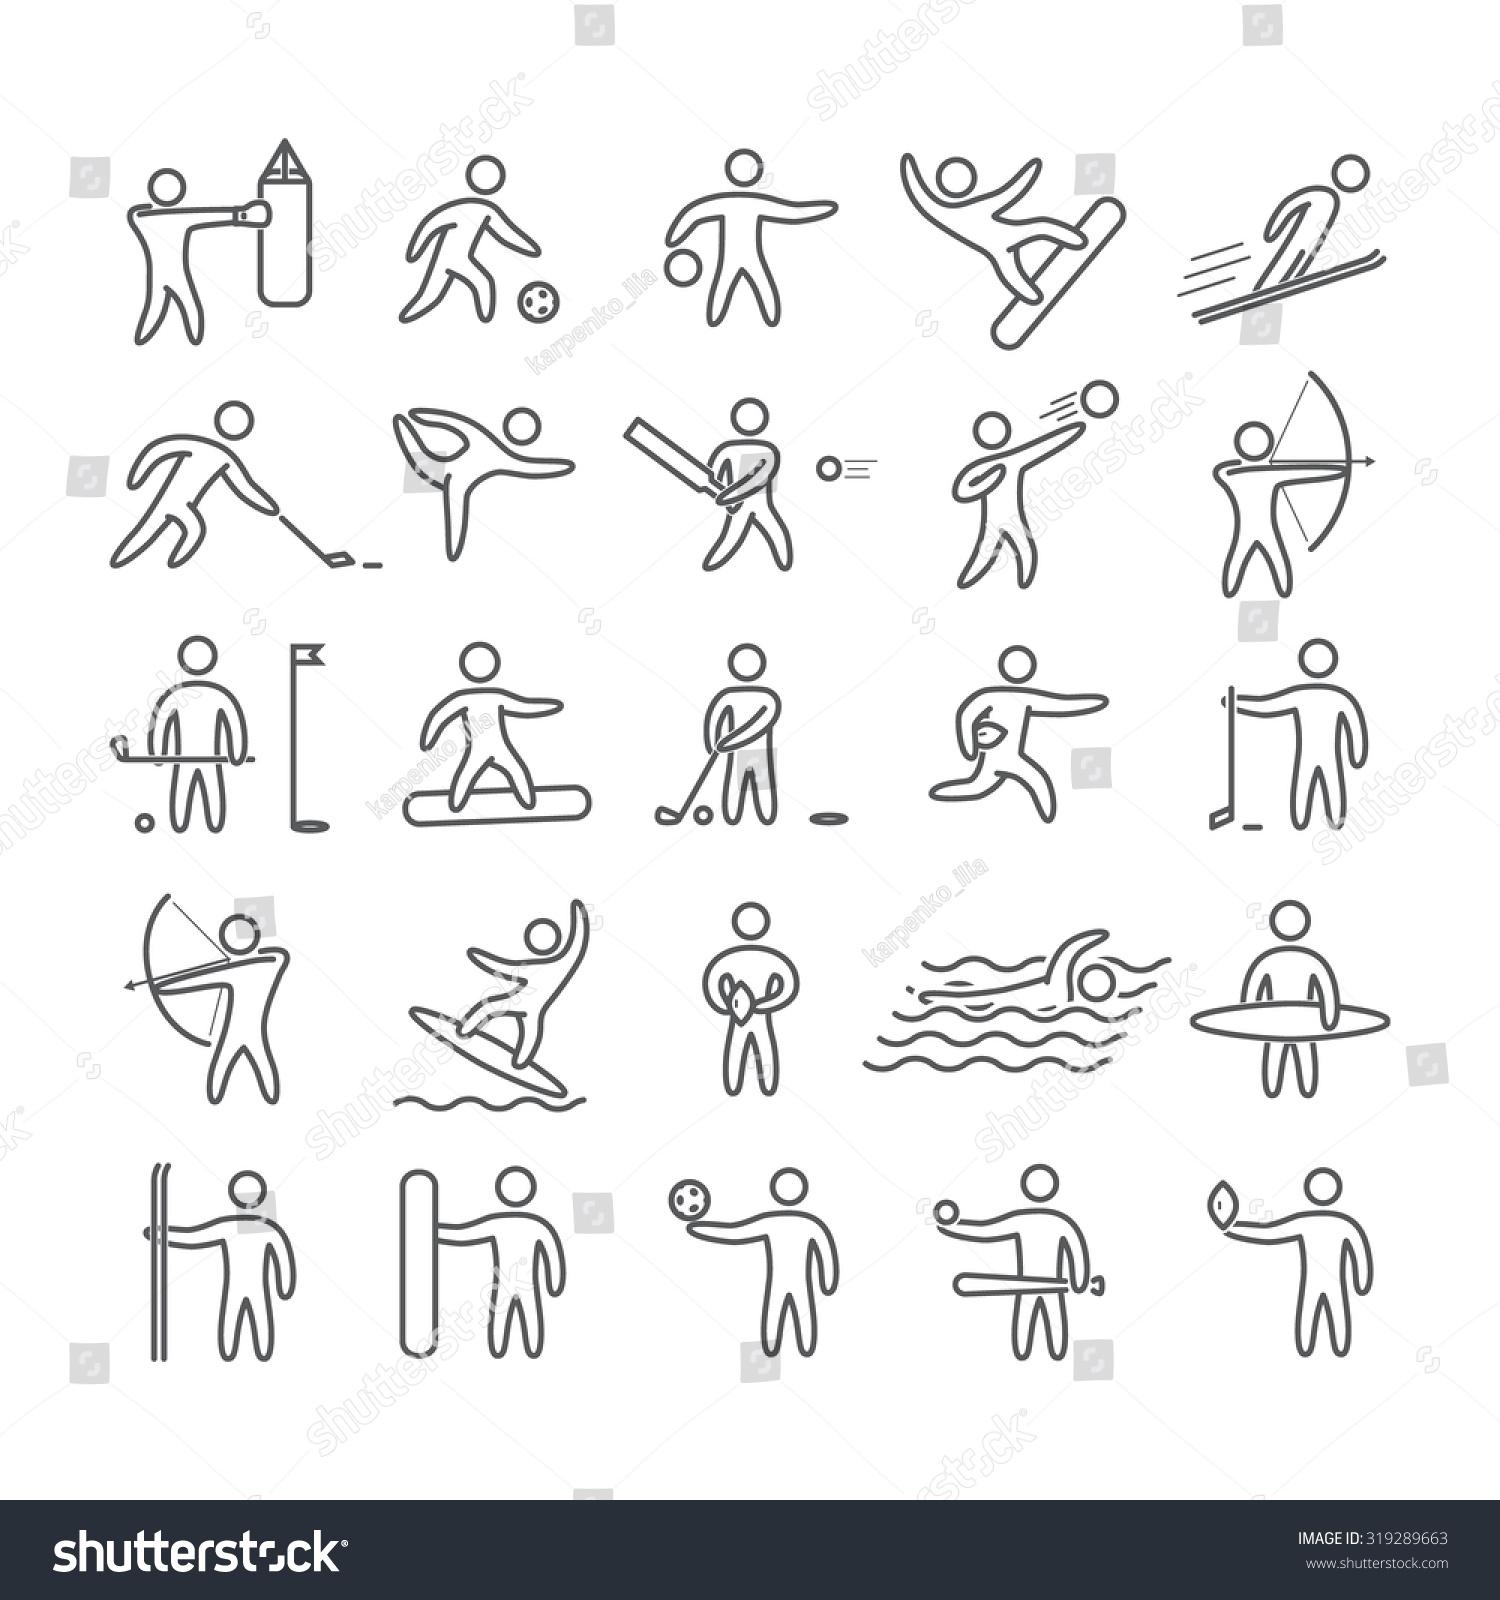 Line Art Figures : Line art figures athletes popular sports stock vector